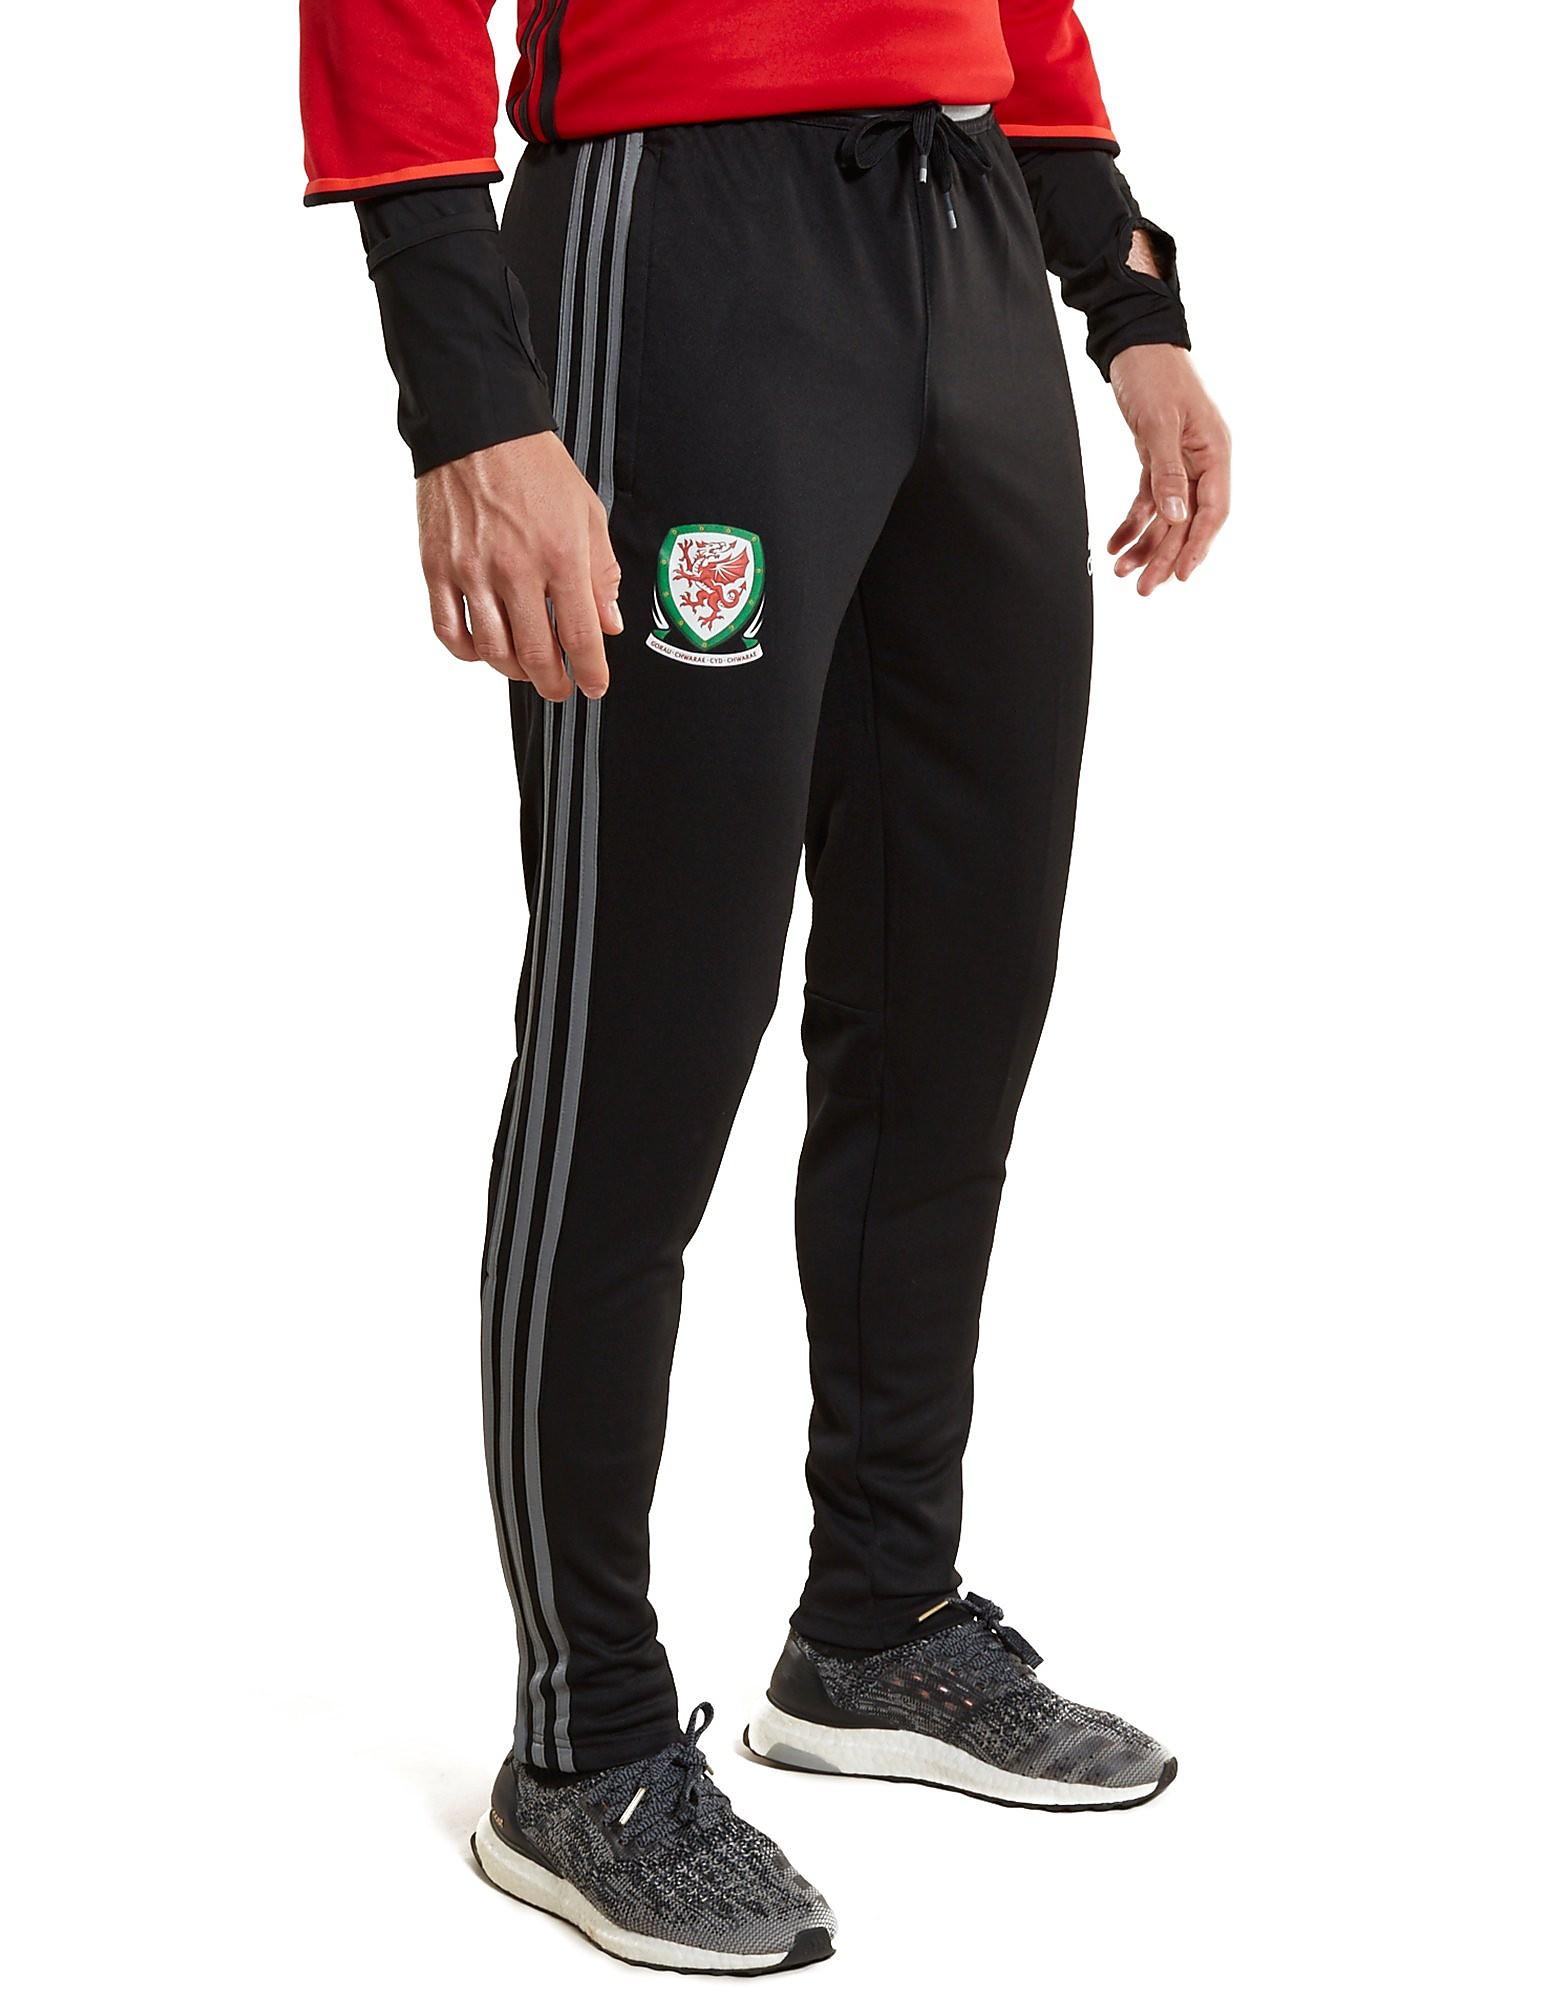 adidas Wales 2016/17 Training Pants